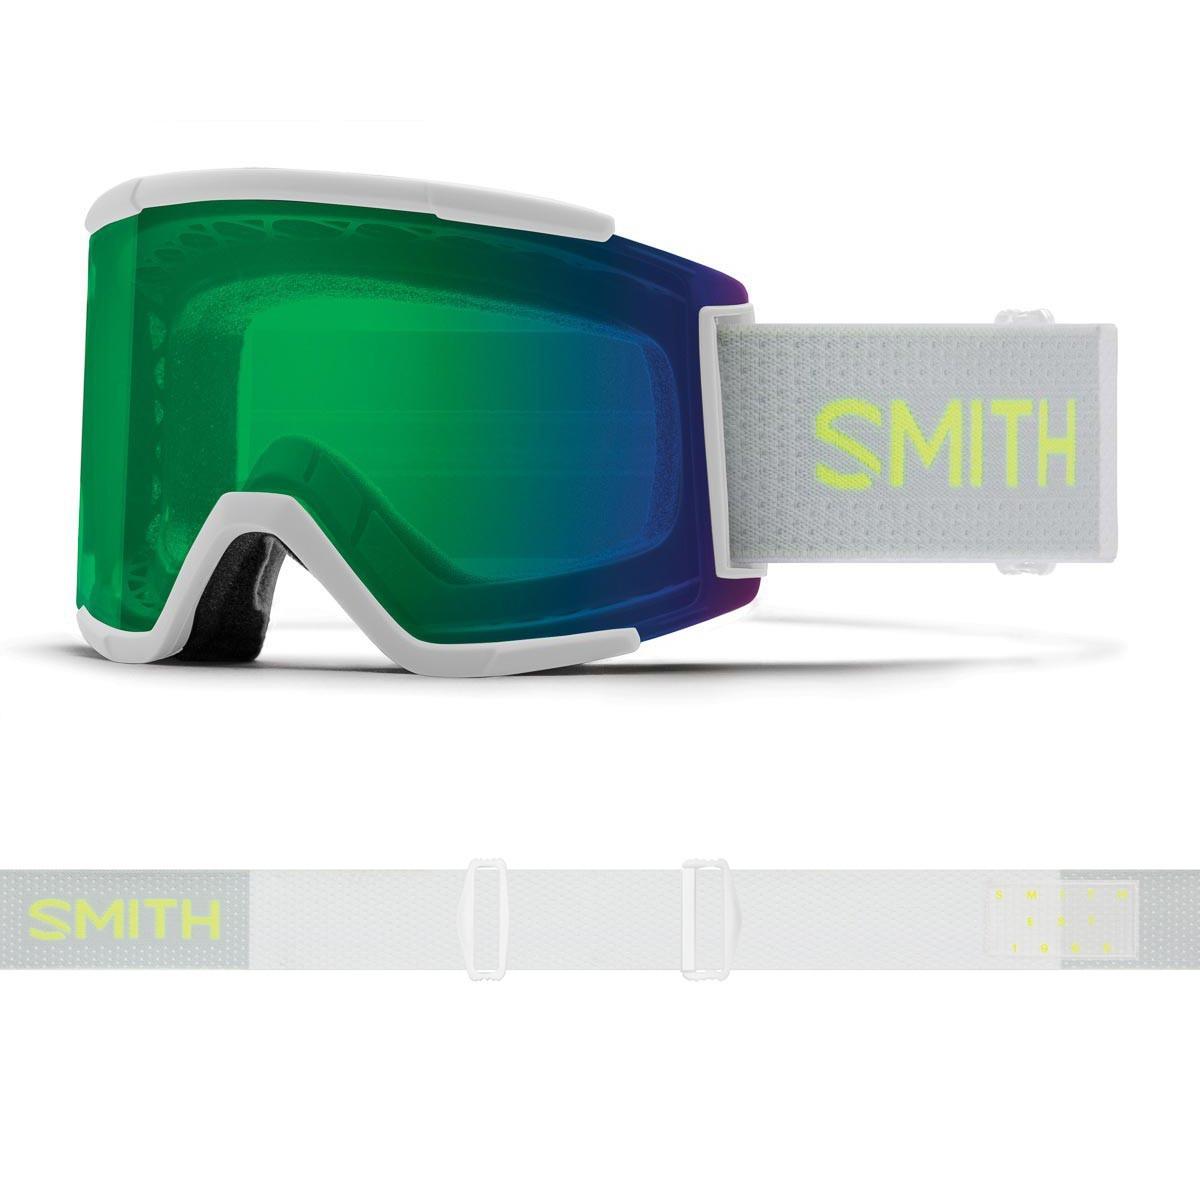 SMITH SQUAD XL sport white | S2 CHROMAPOP Everyday Green Mirror - Изображение - AQUAMATRIX